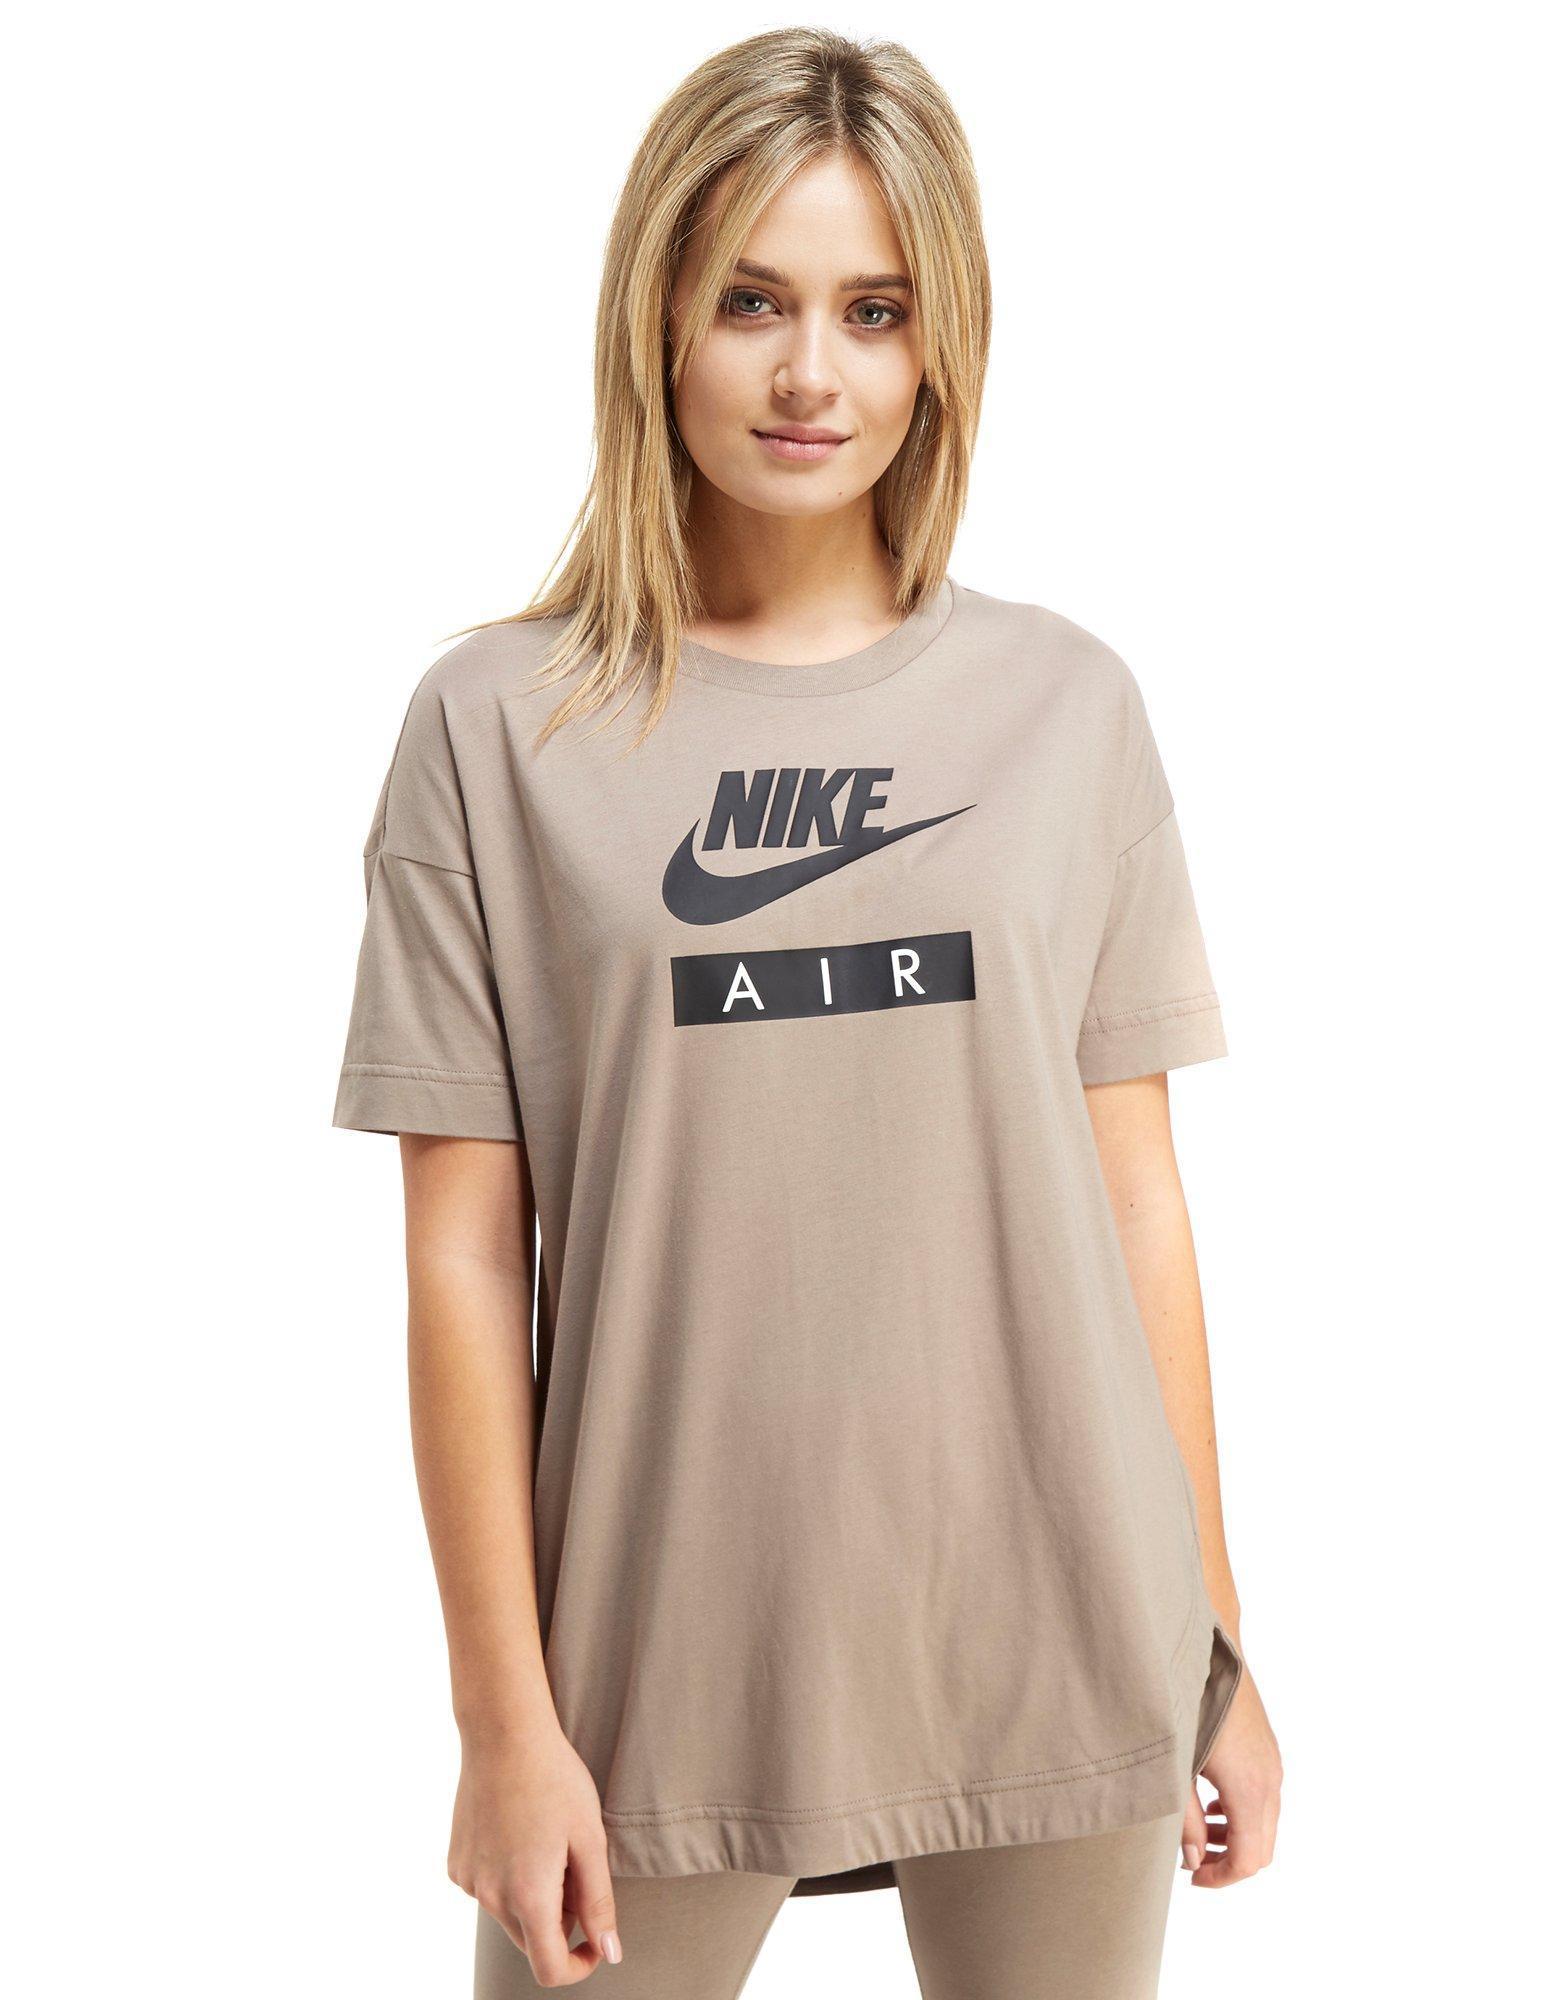 super cheap good out x the cheapest Jd Sports Nike Womens Tops | RLDM